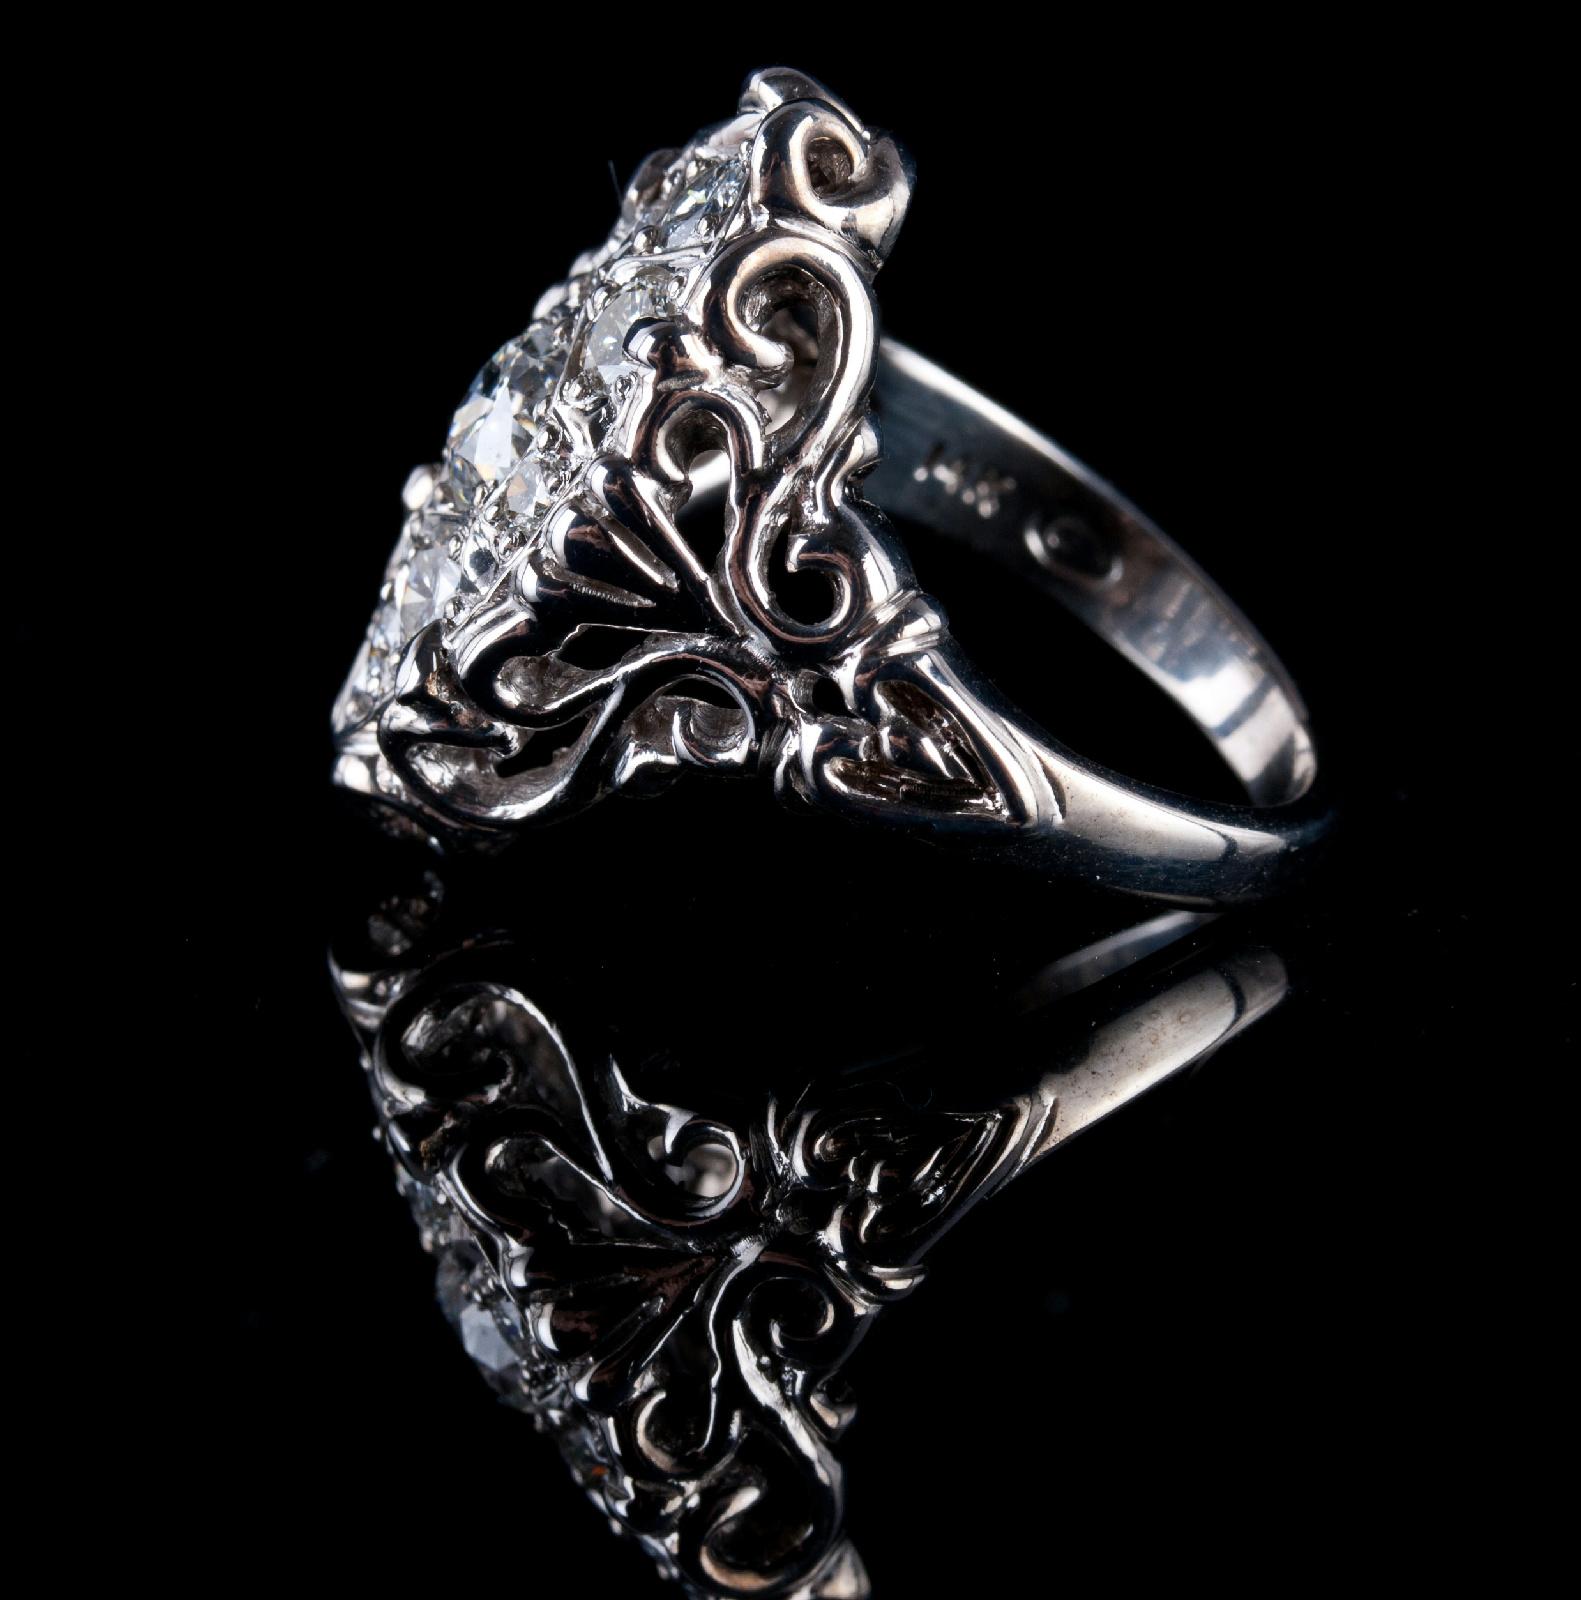 Custommade Diamond: 14k White Gold Custom Made Vintage Style Diamond Cluster